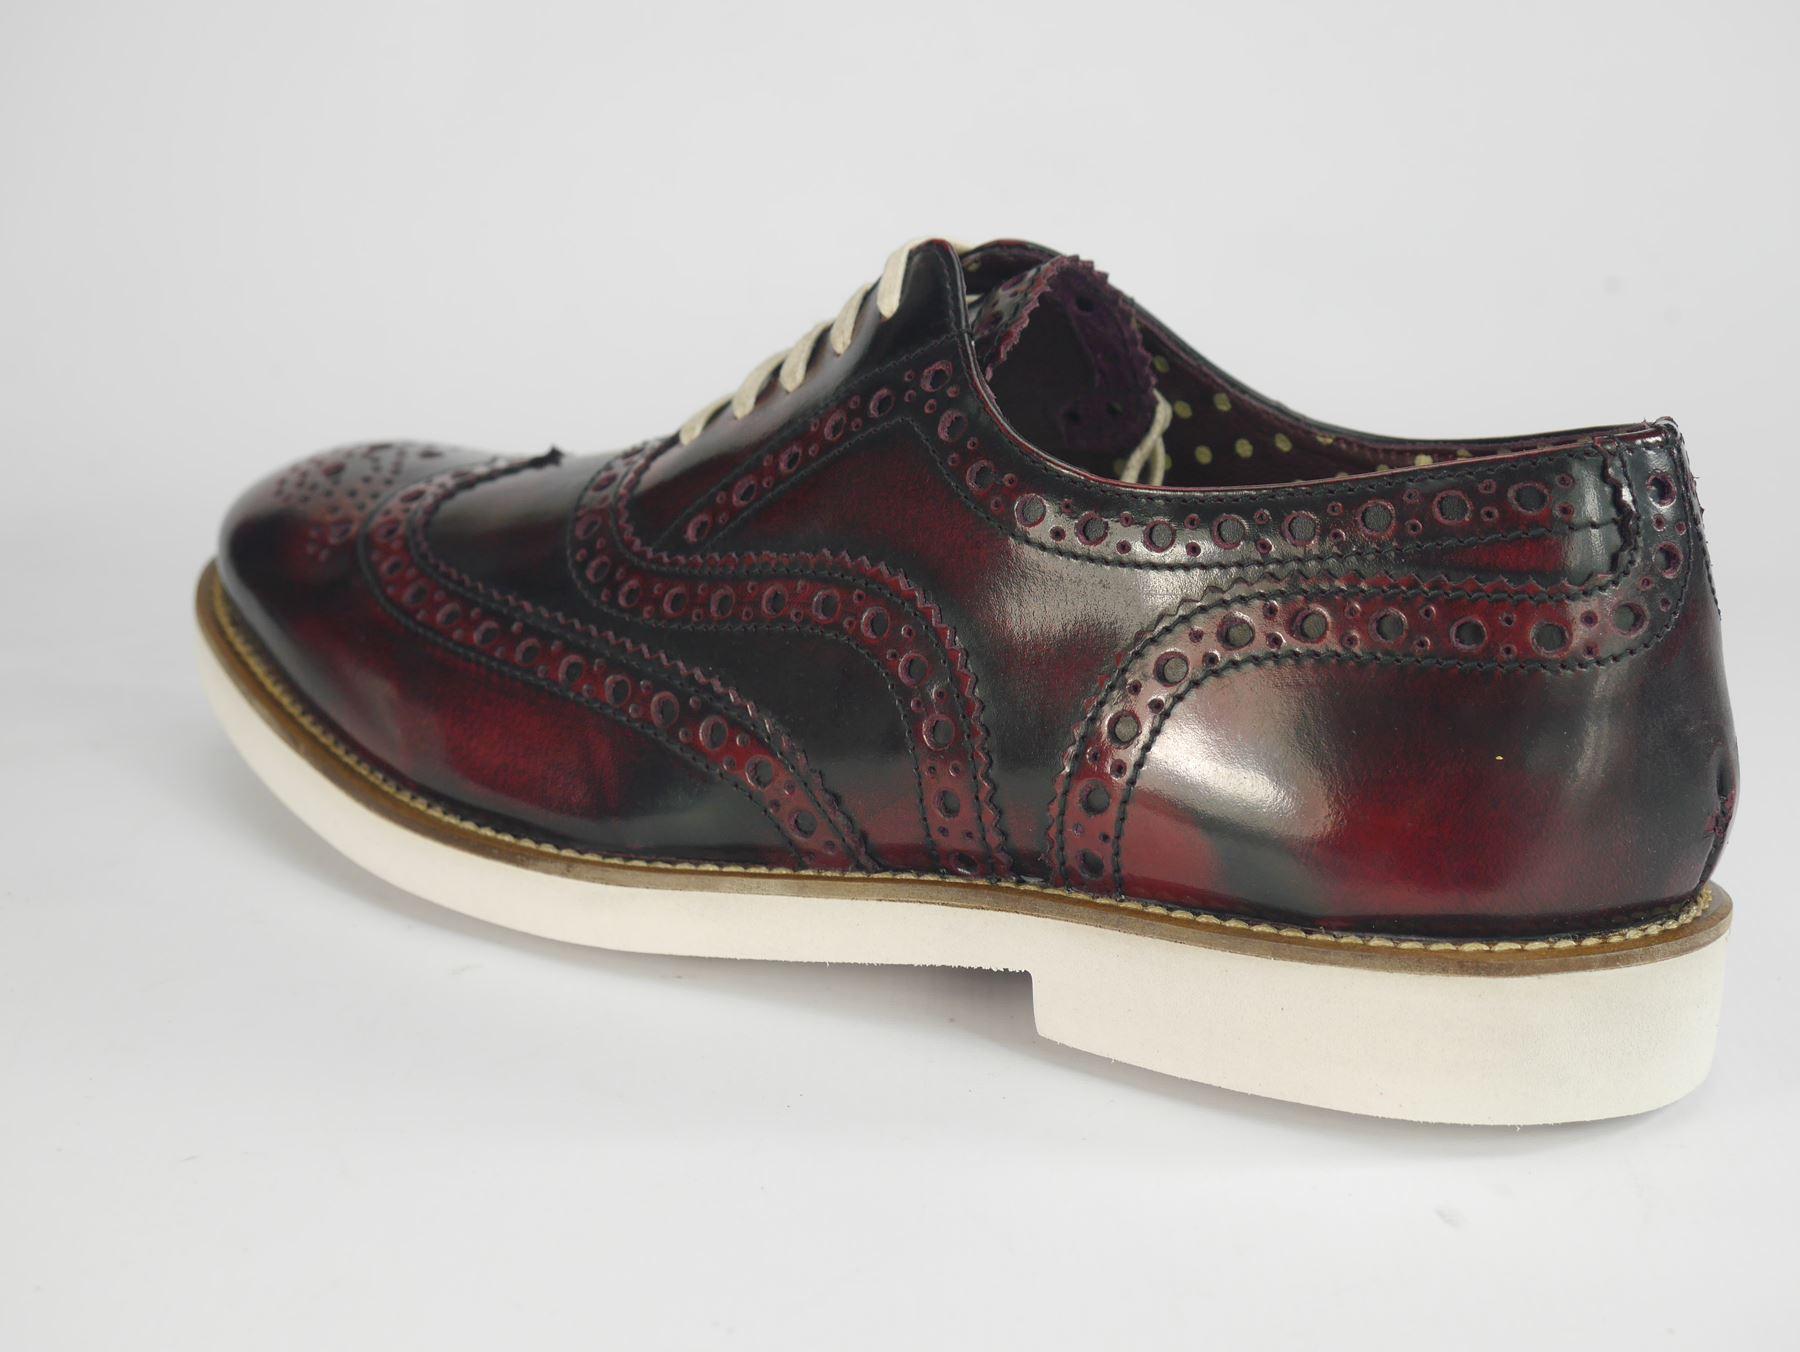 Brogues Shoes Bordo Lace London Bianco Mens Farnham d1SFdTa